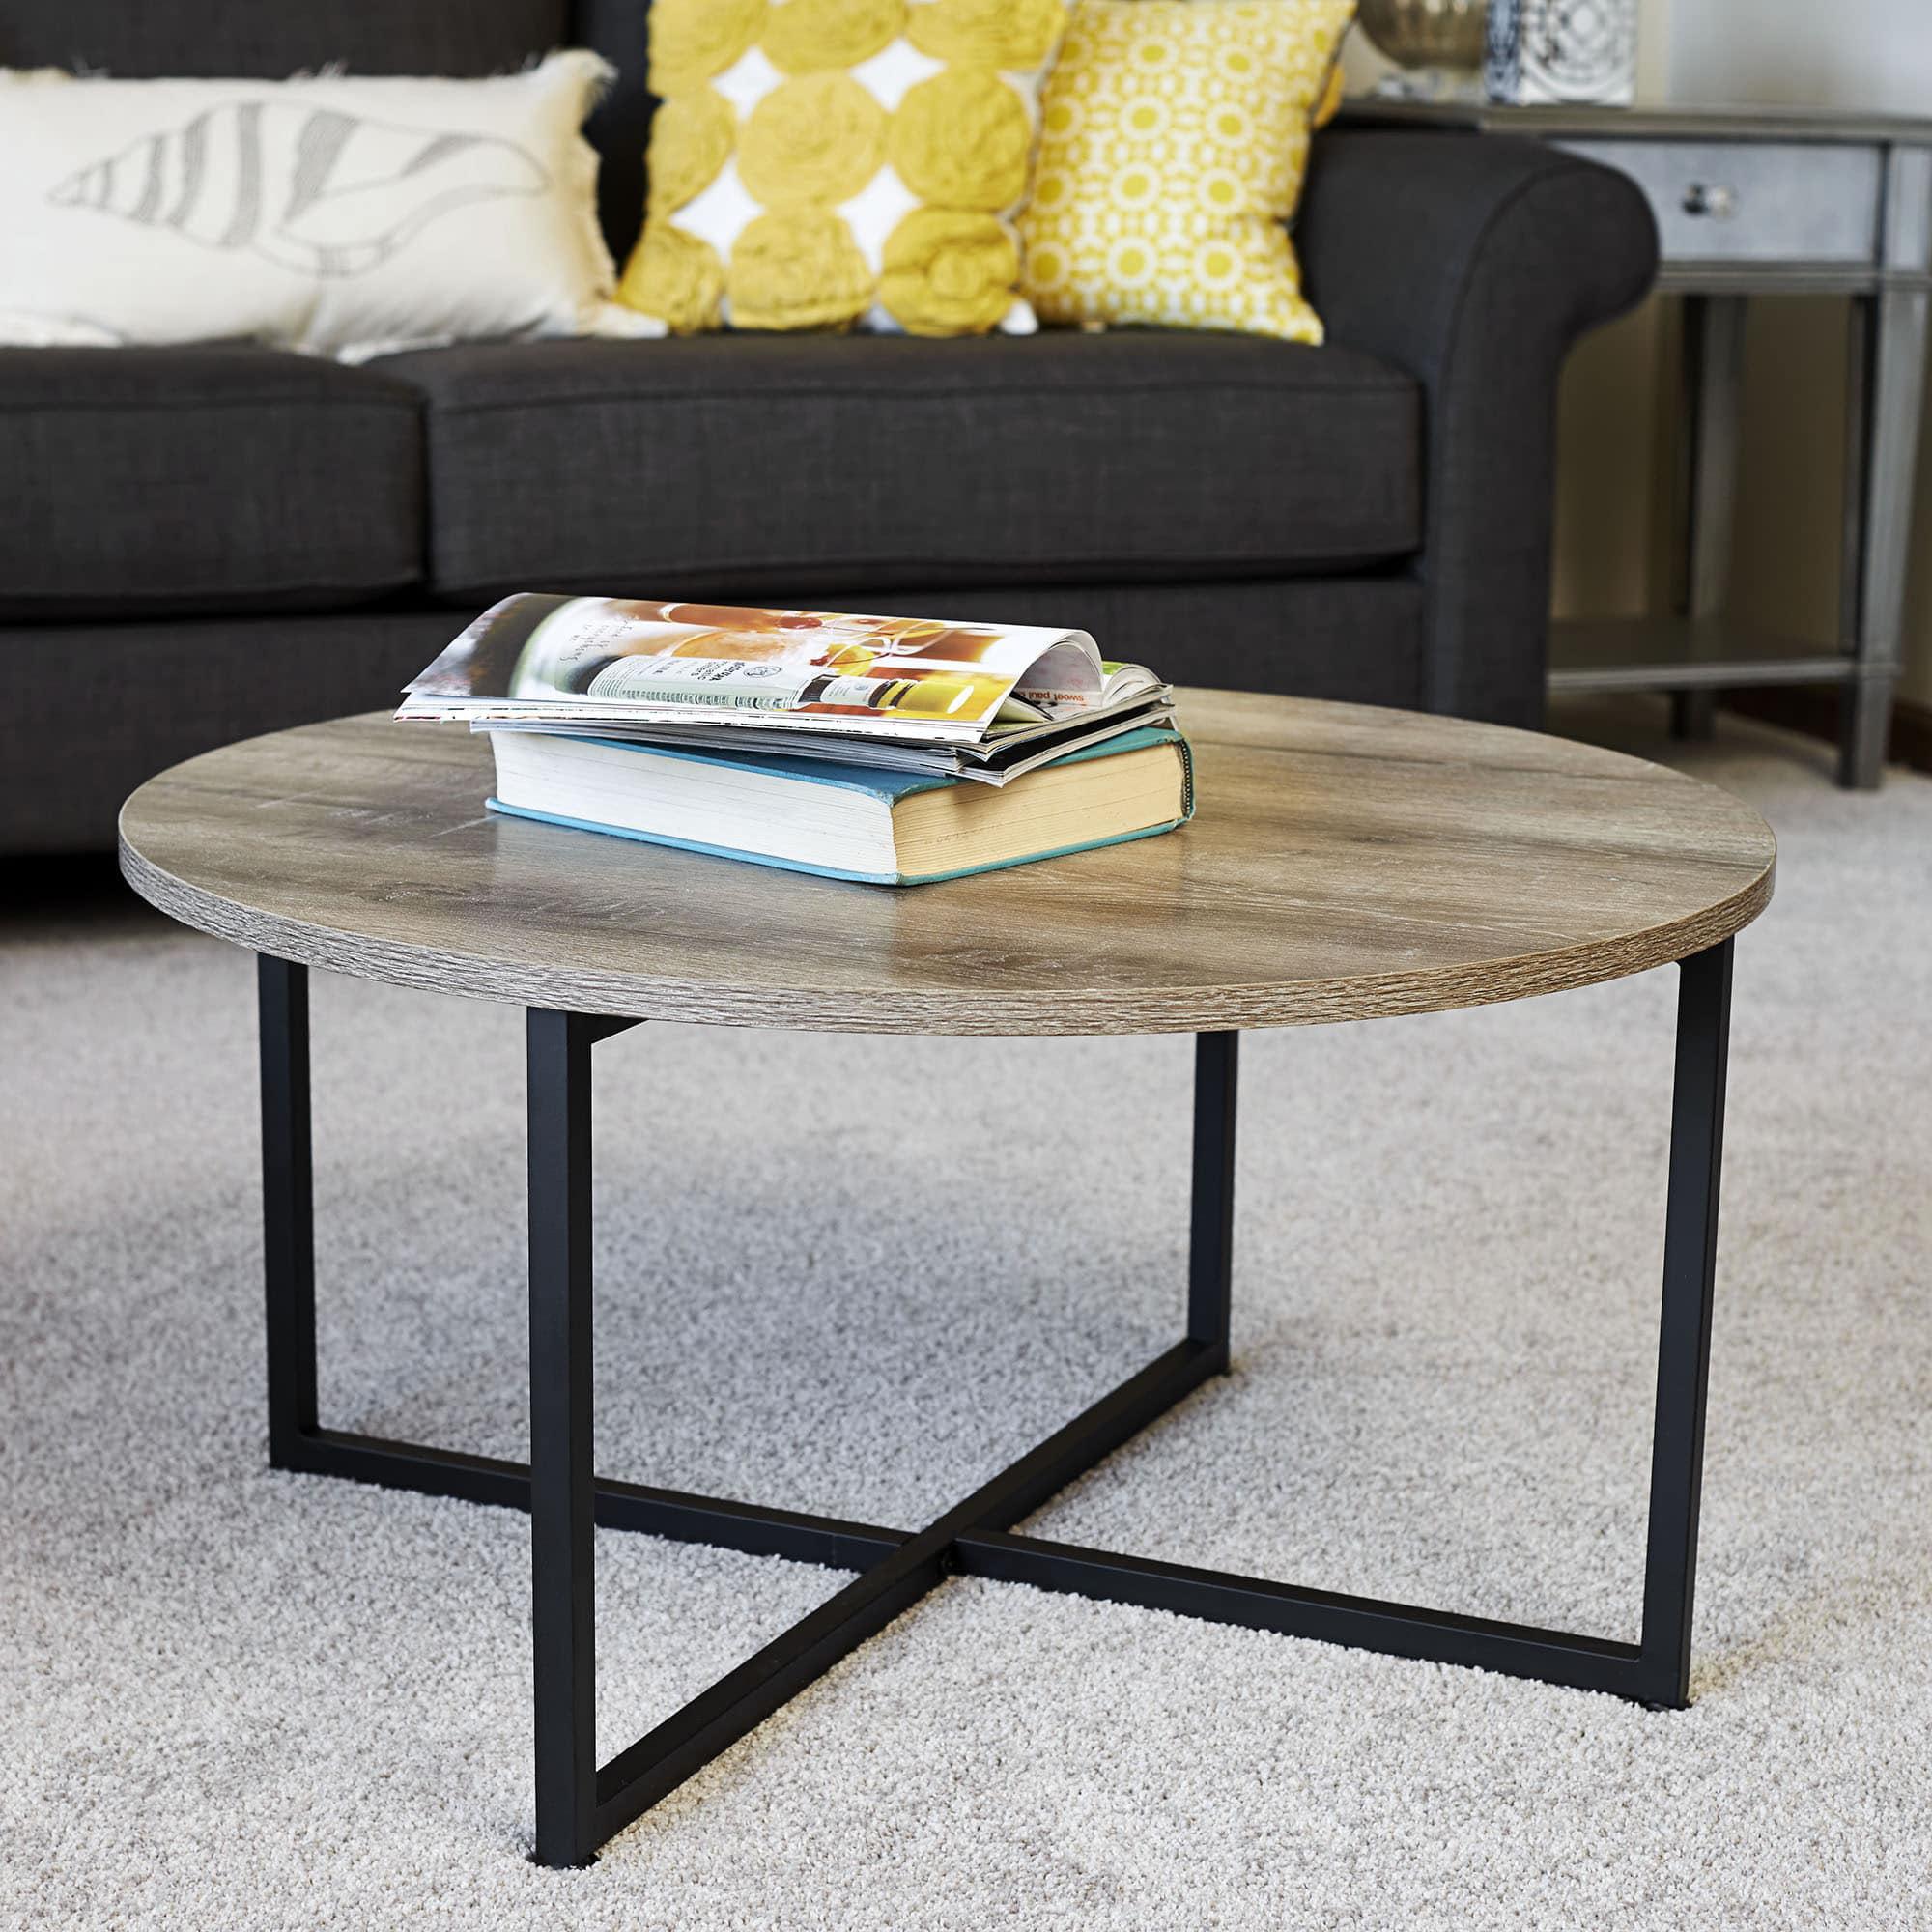 - Household Essentials Ashwood Round Coffee Table - Walmart.com